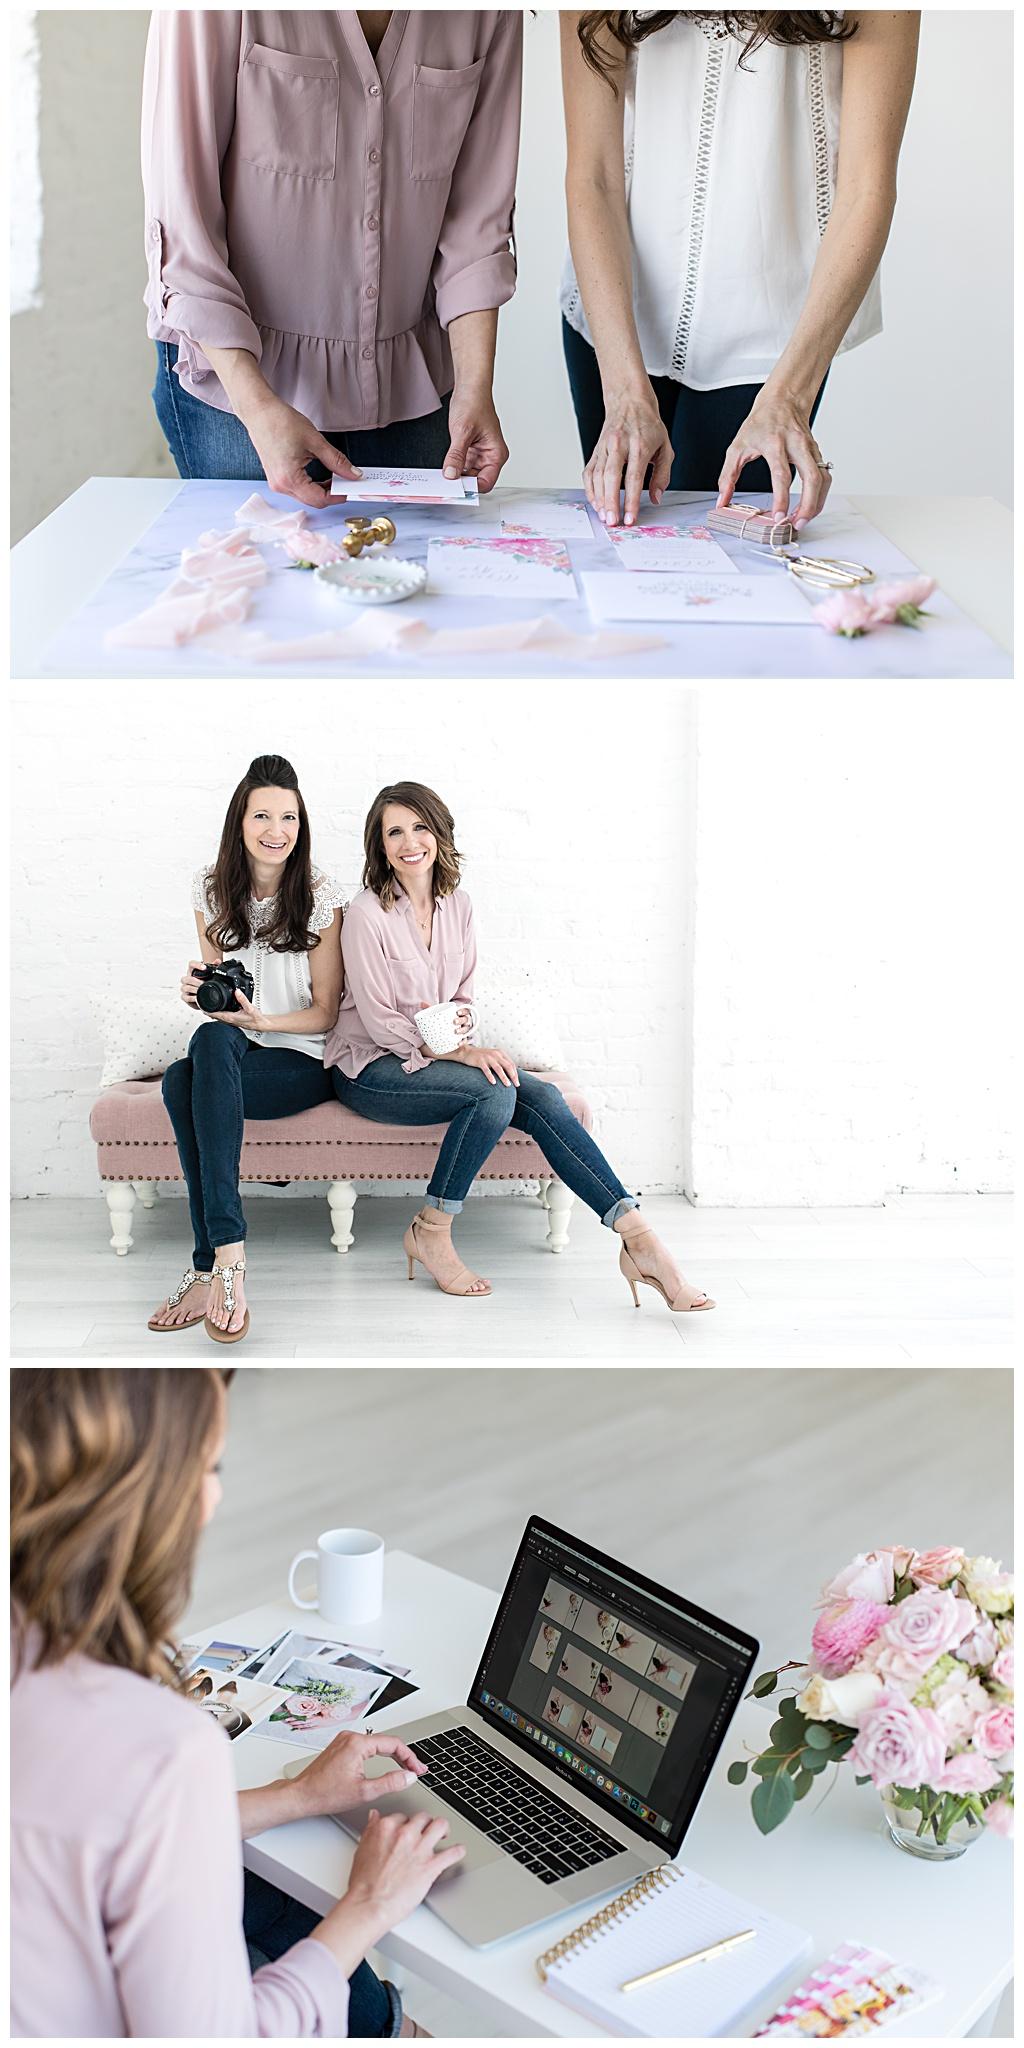 custom_product_photographer13.jpg